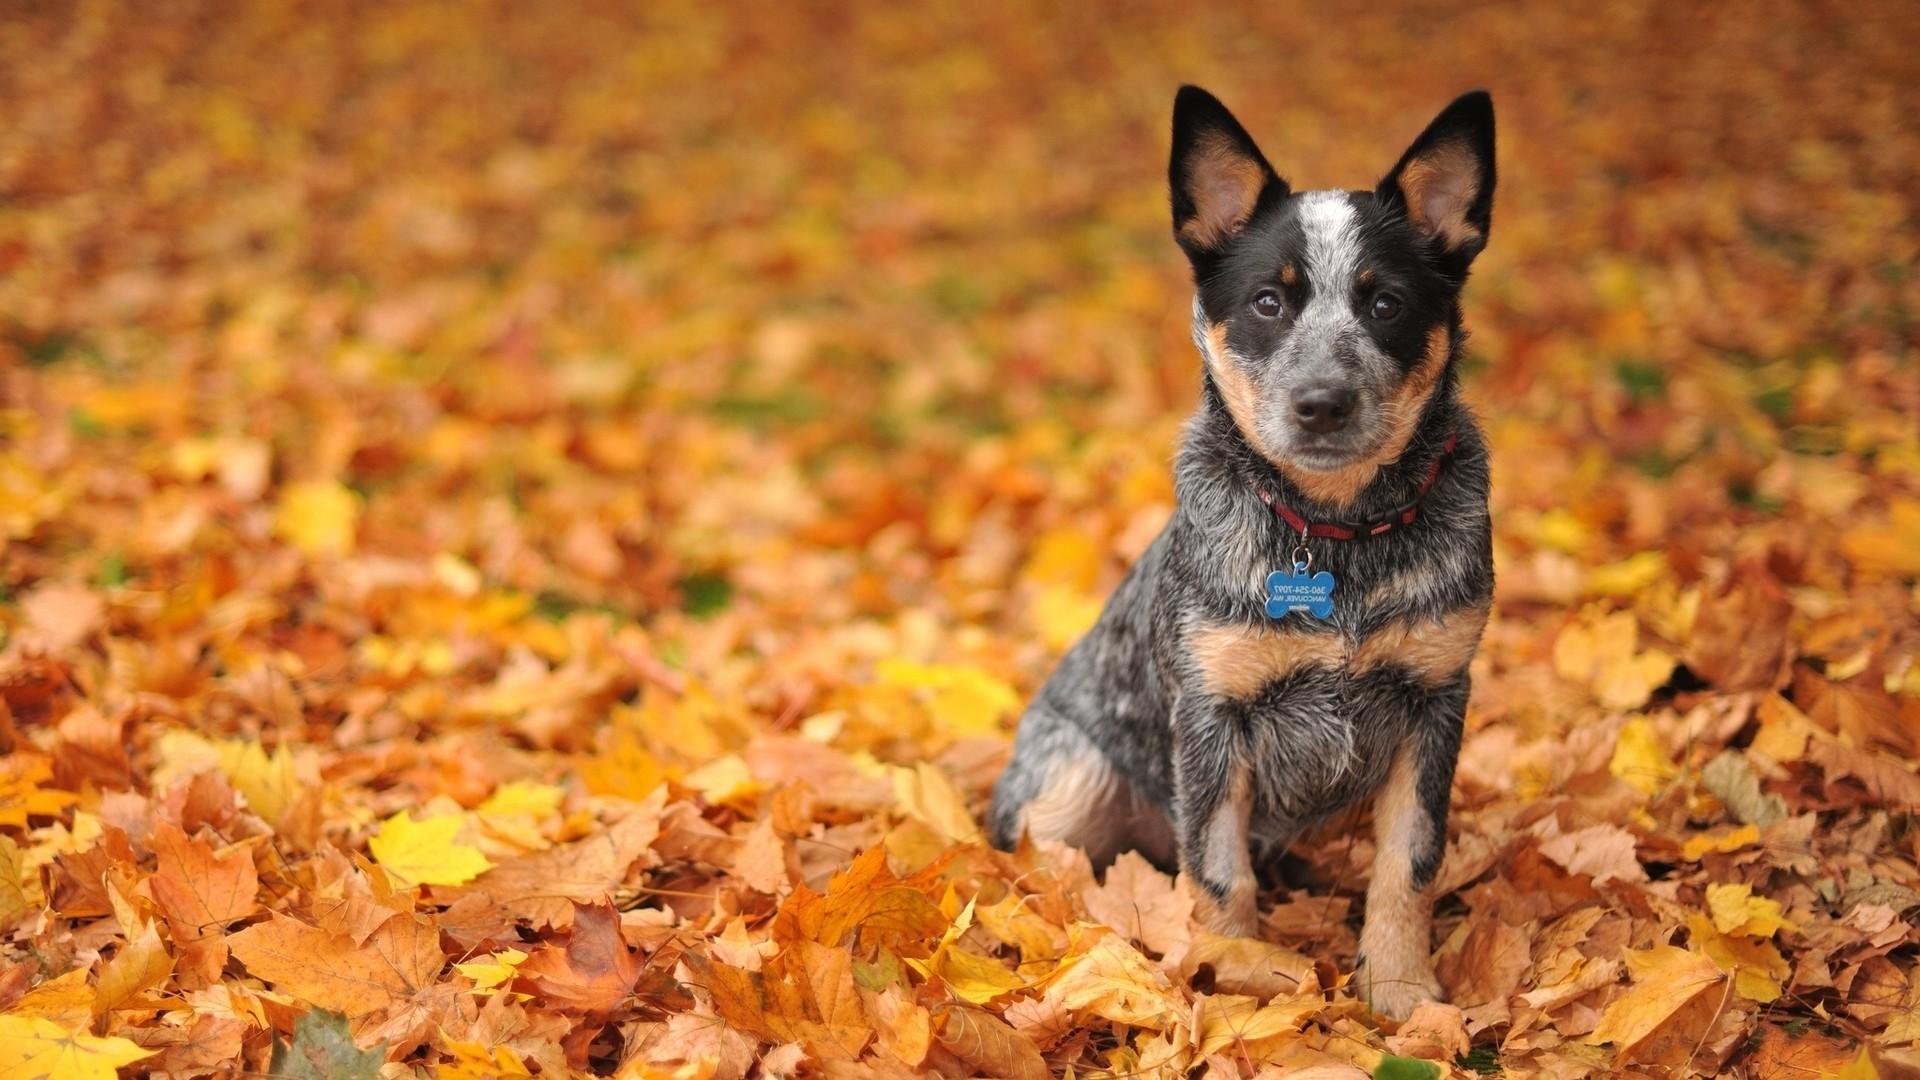 Res: 1920x1080, Australian shepherd puppy on the autumn leaves